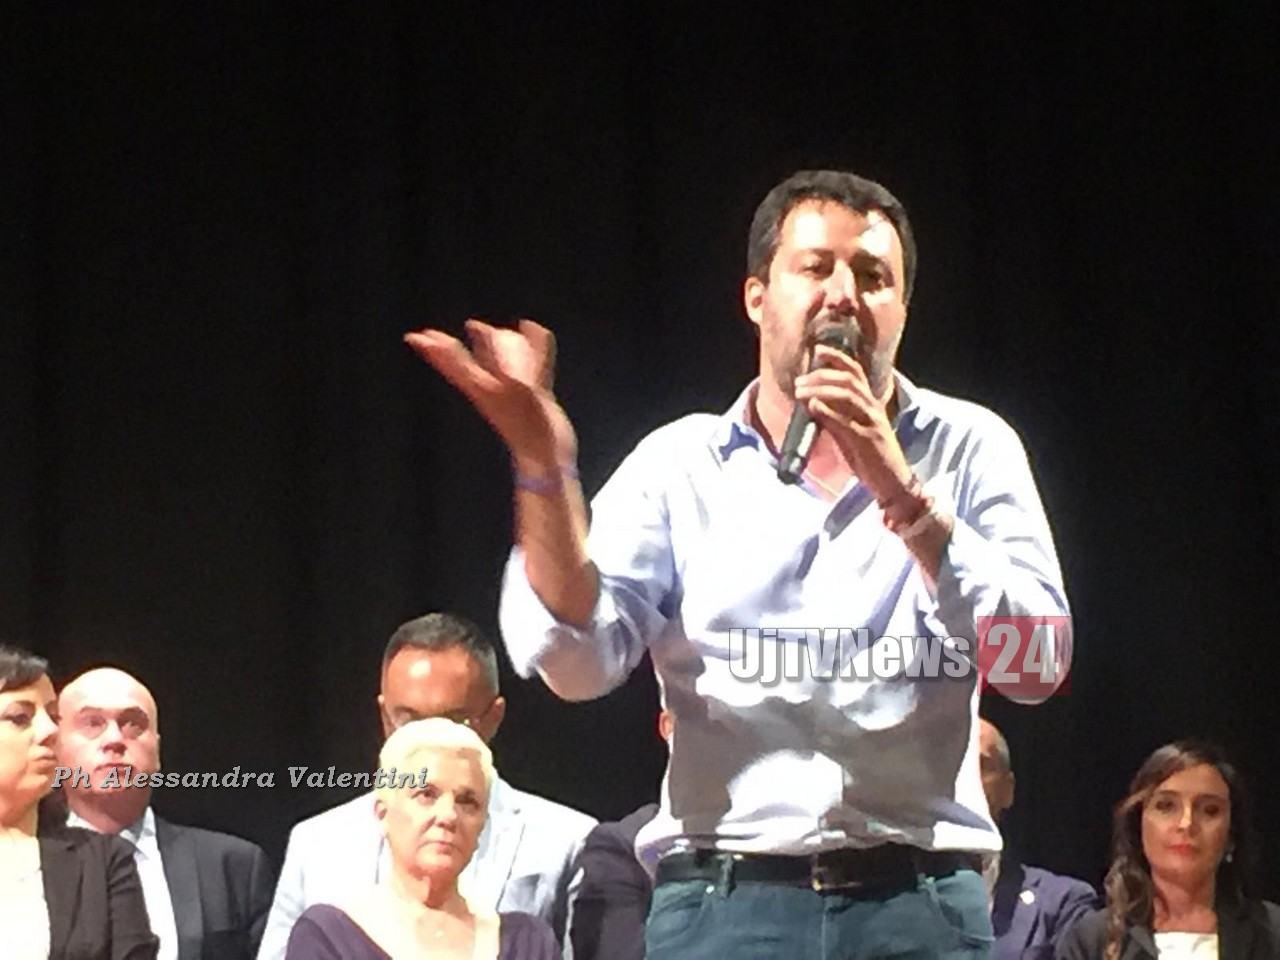 Matteo Salvini a Fabro e Orvieto, giovedì 17 ottobre